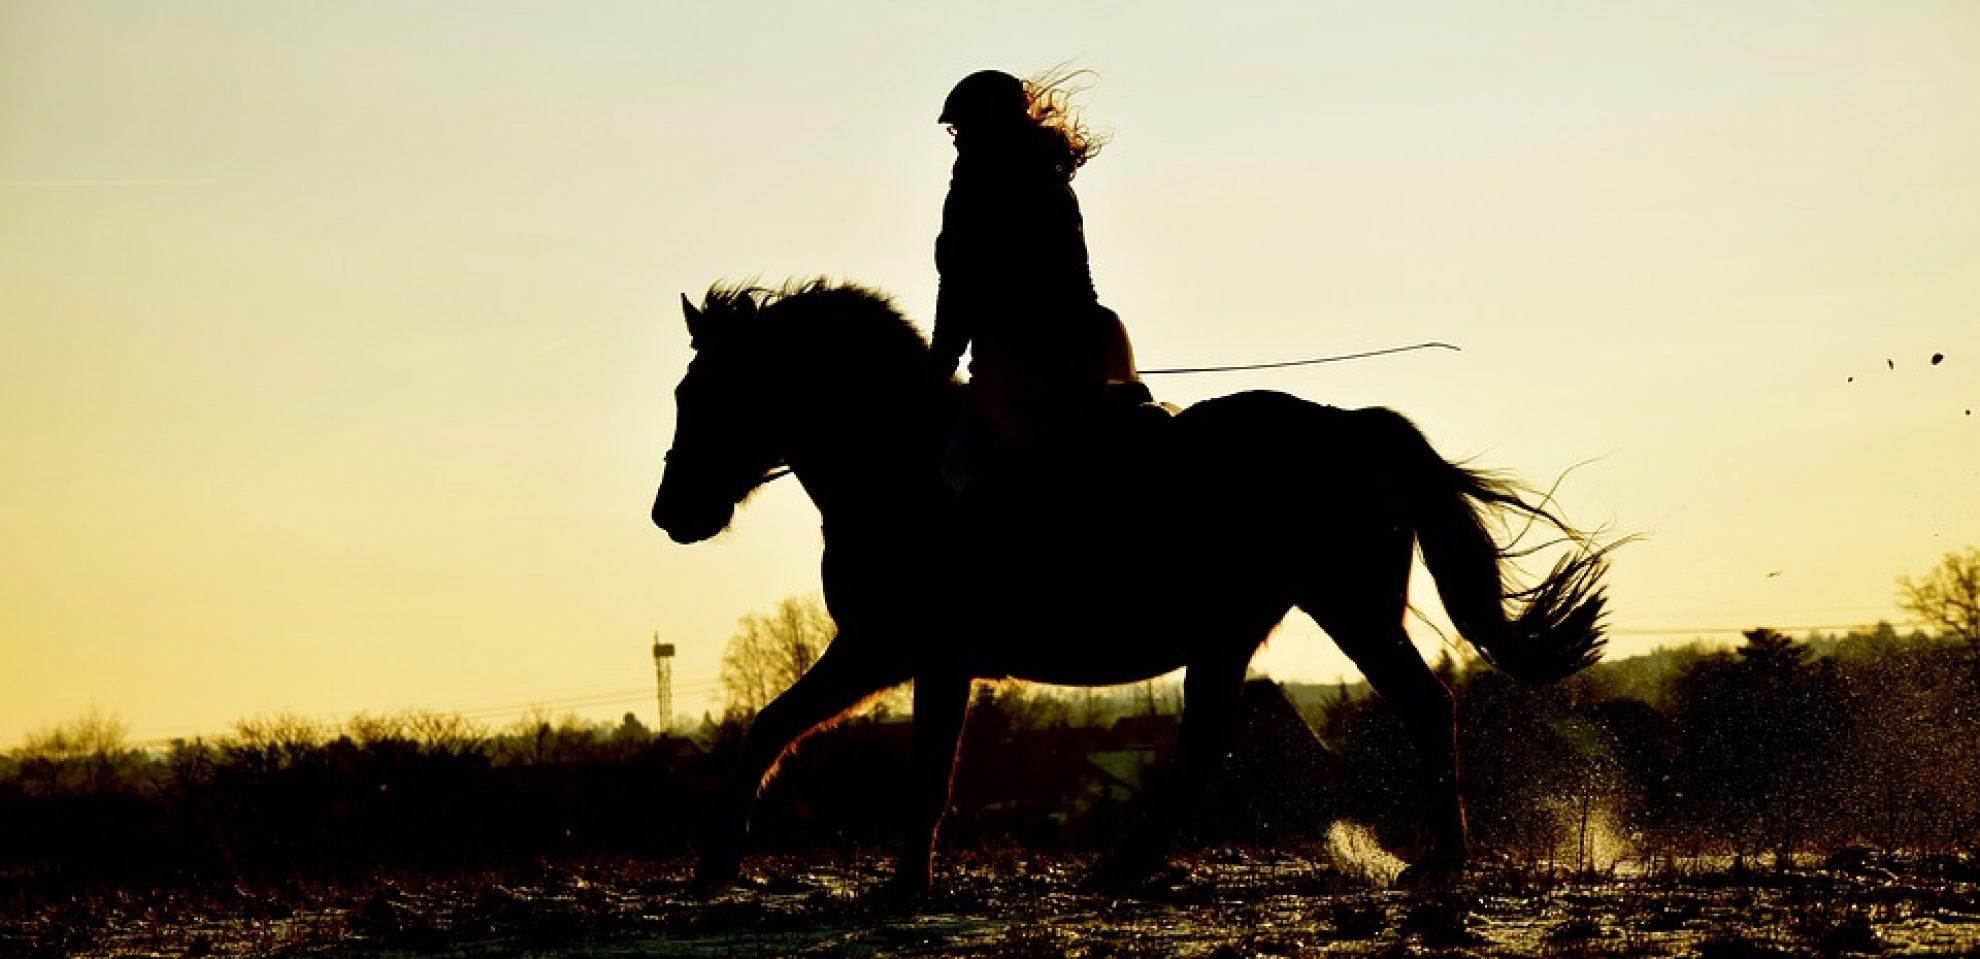 Cropped Gallop Horse Silhouette Sunset Reiter Ride Black 2469007 5 Jpg Tolt Club